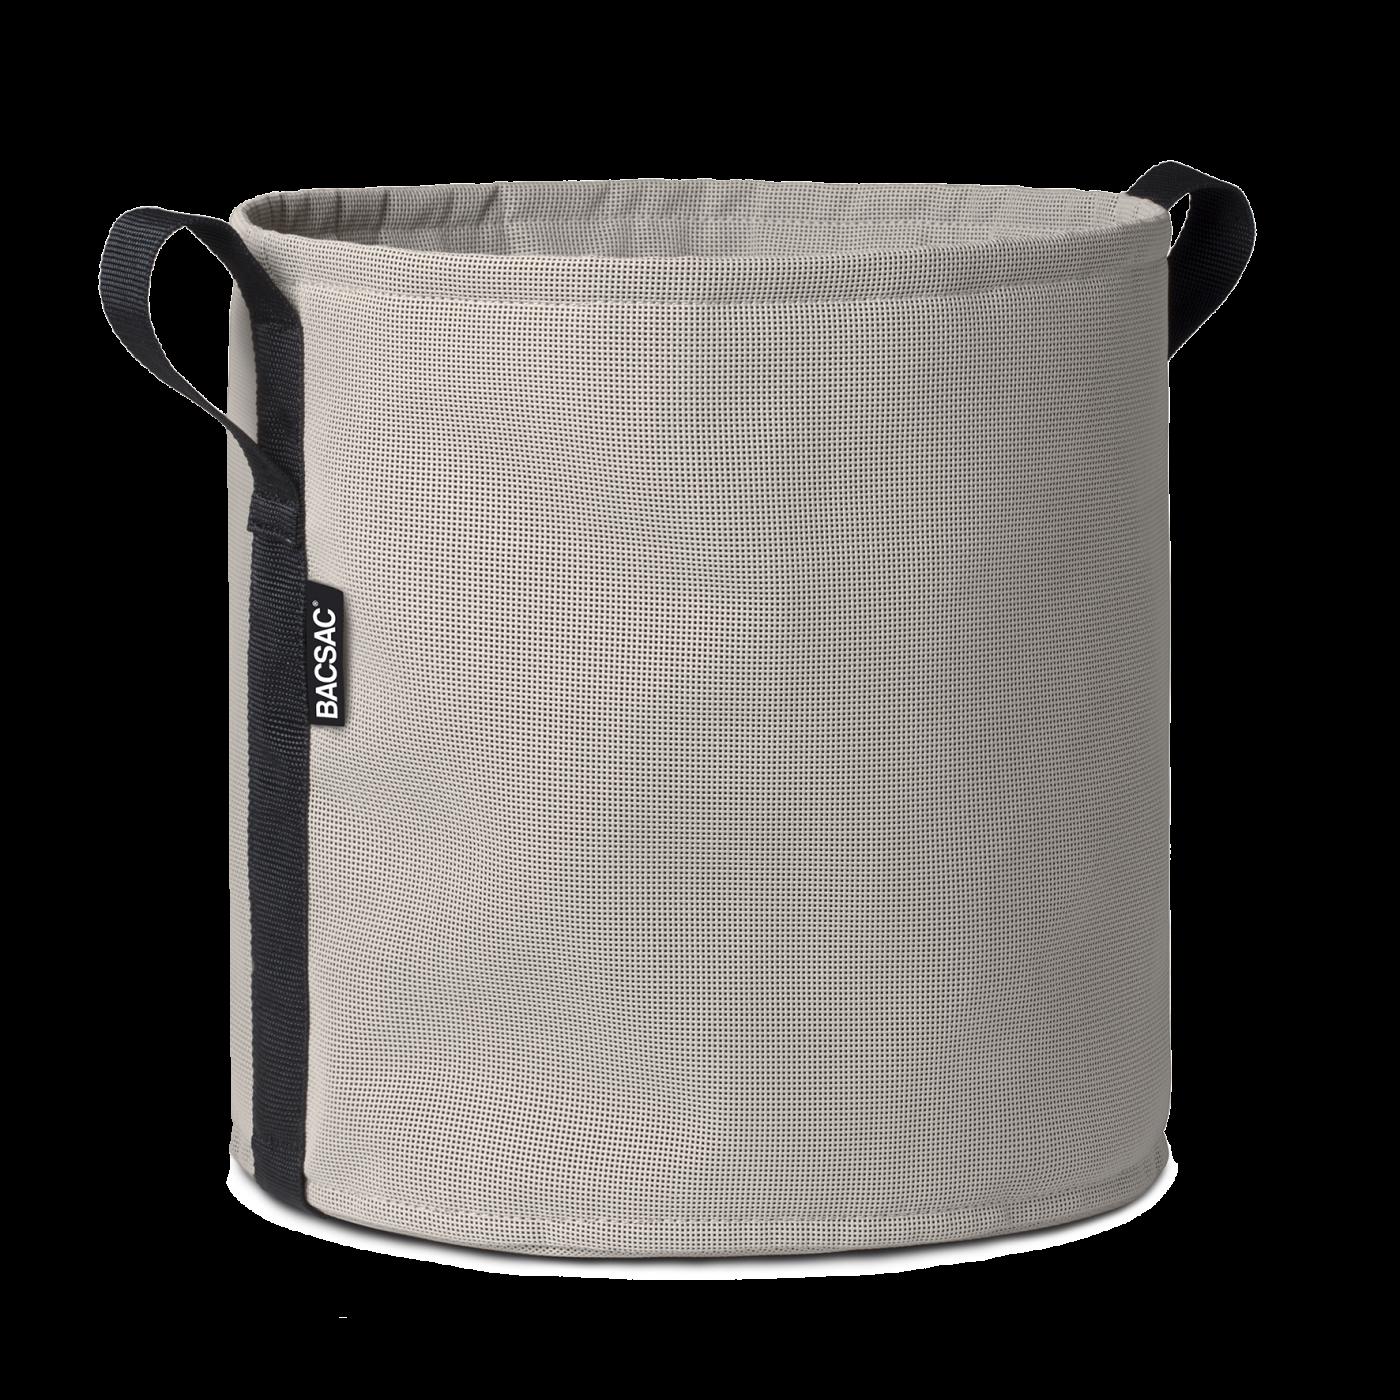 Strapped bag (10L) Saint Jacques Stone